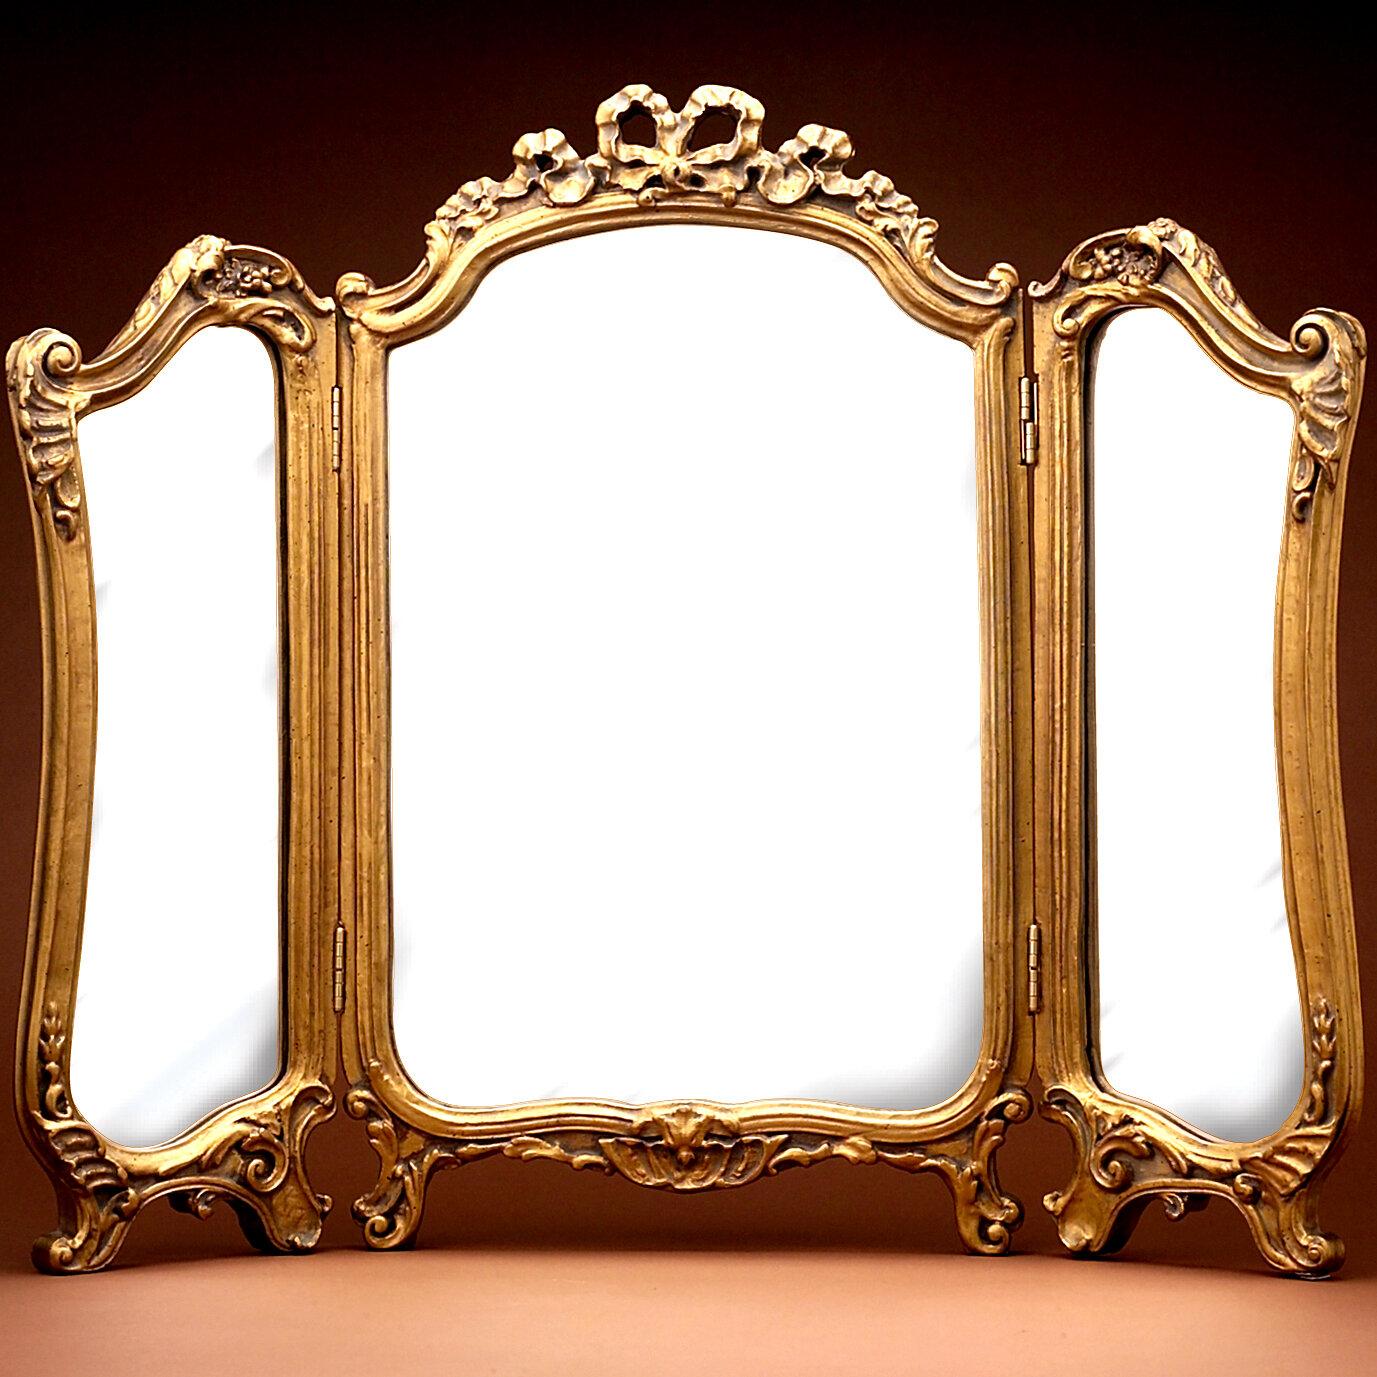 Hahne Tri Fold Bathroom Vanity Mirror